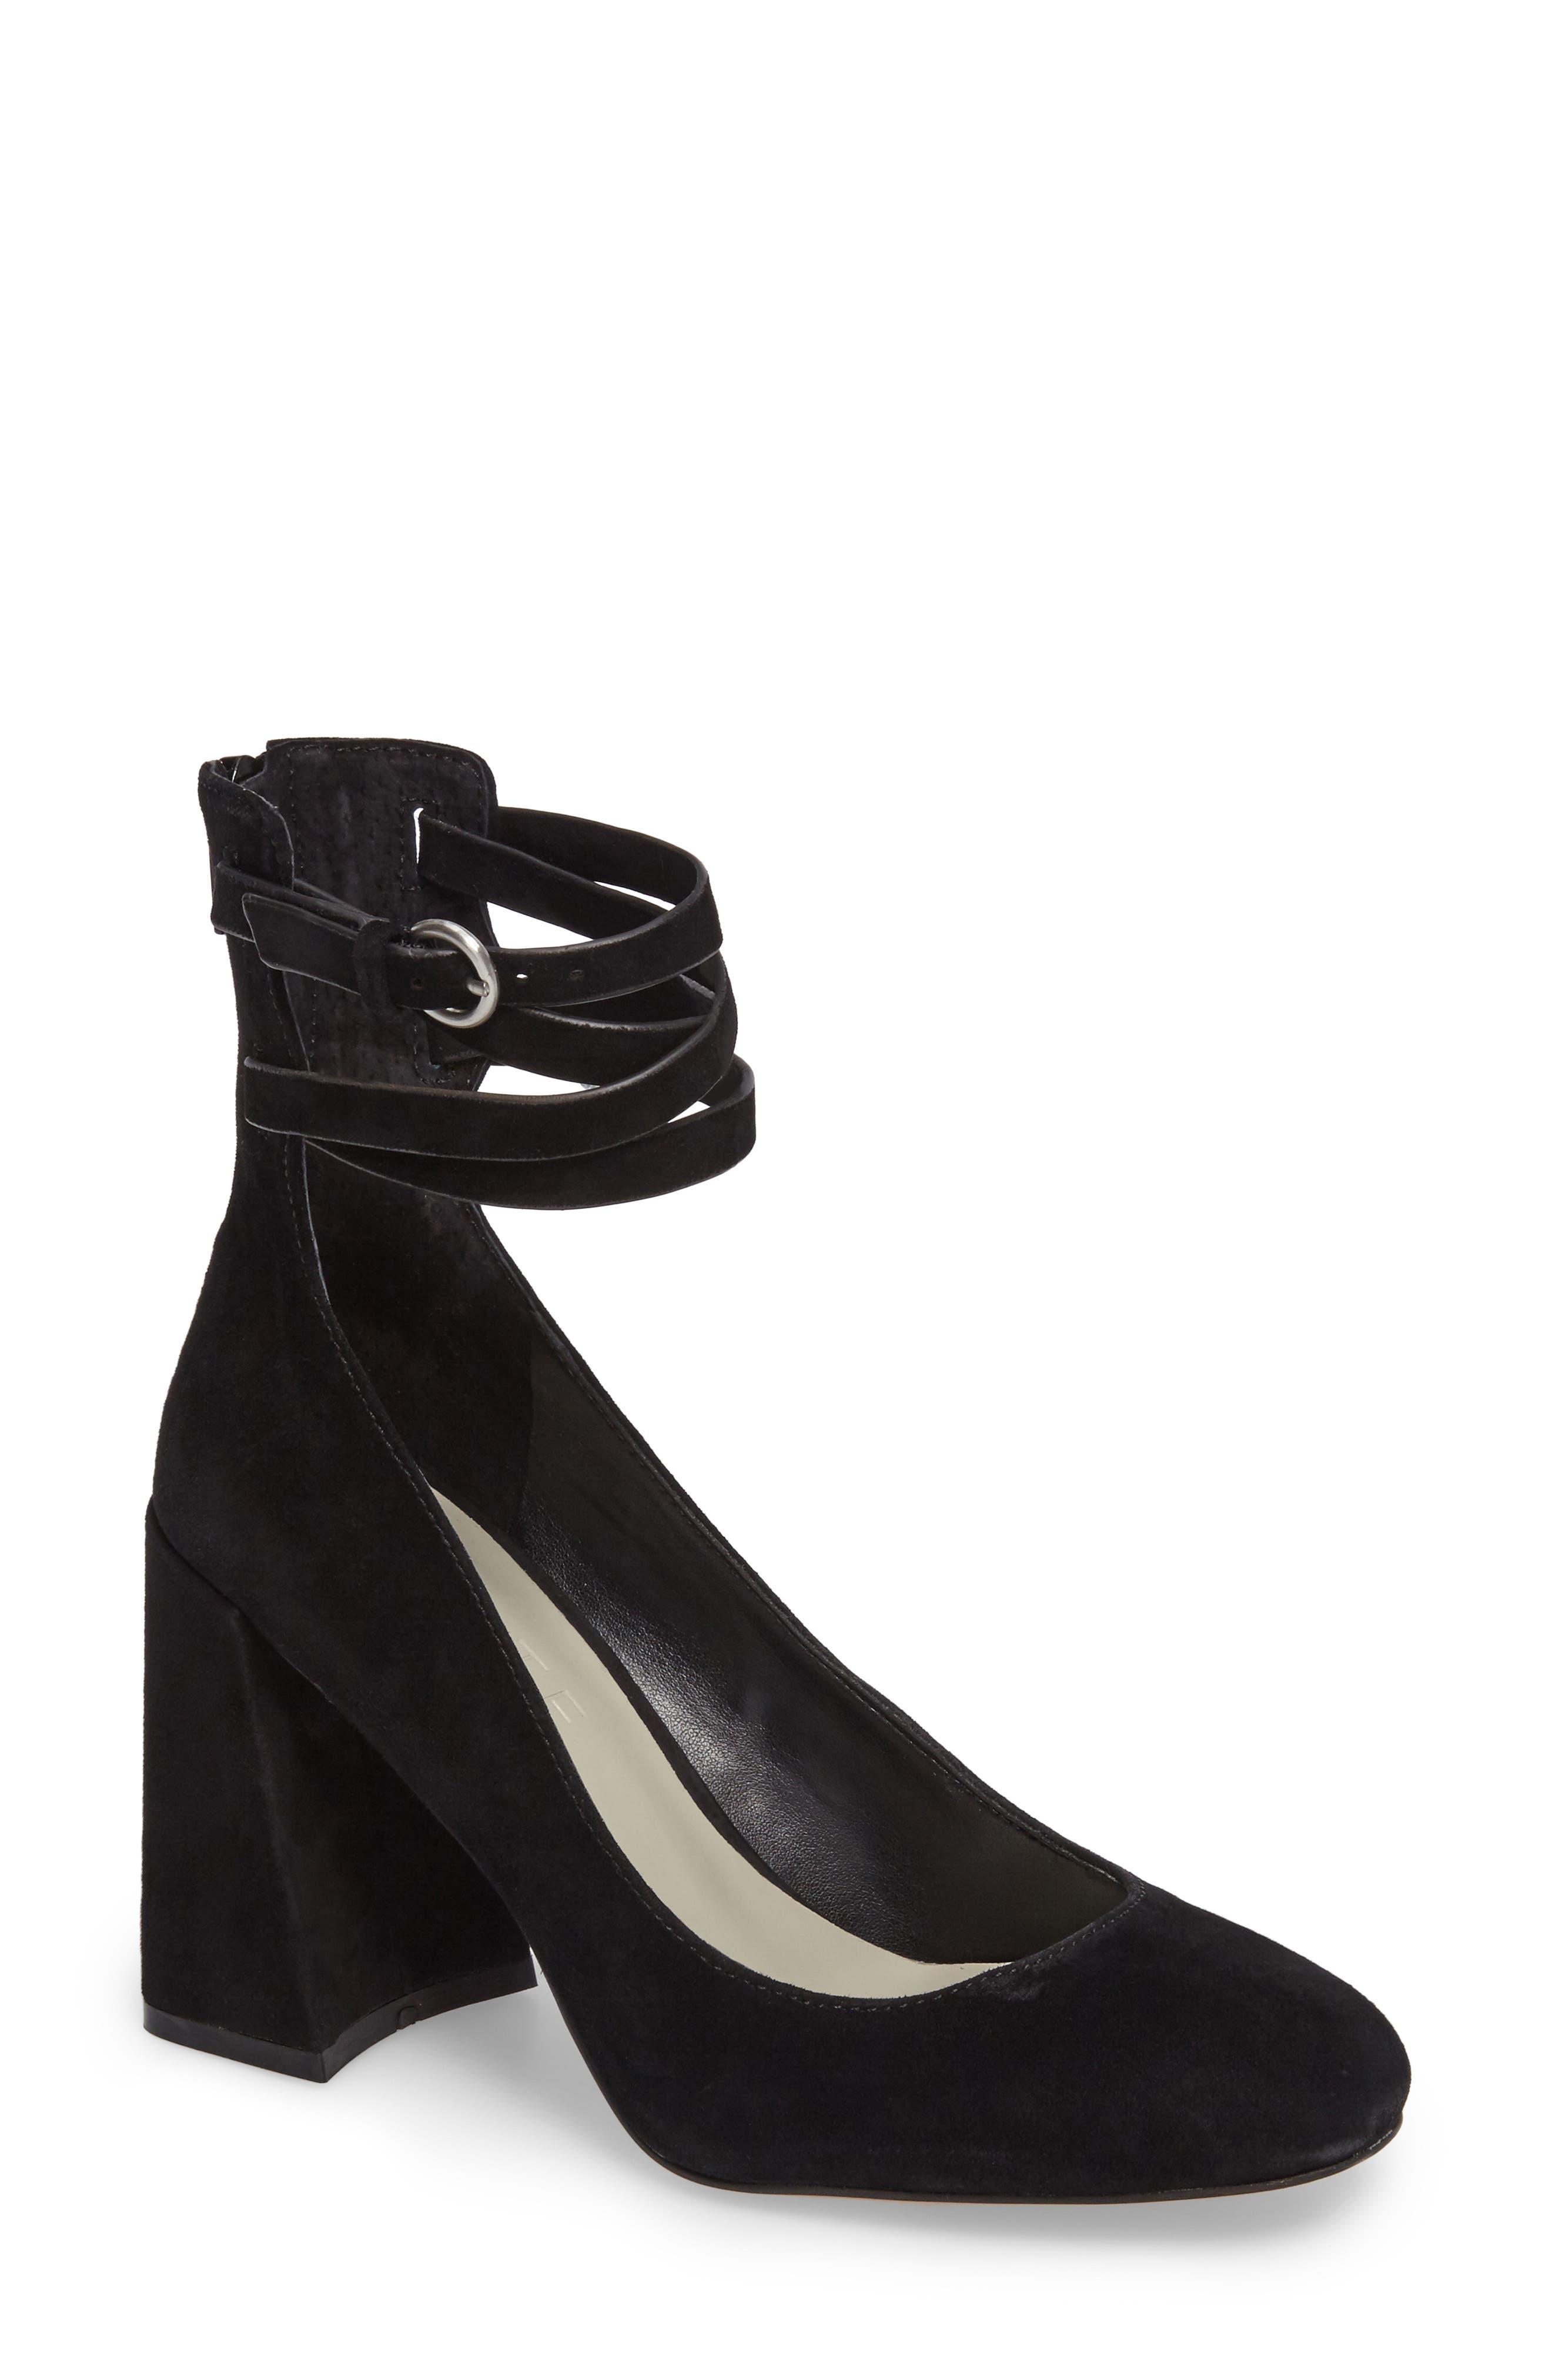 Makal Flared Heel Wraparound Pump,                         Main,                         color, 001